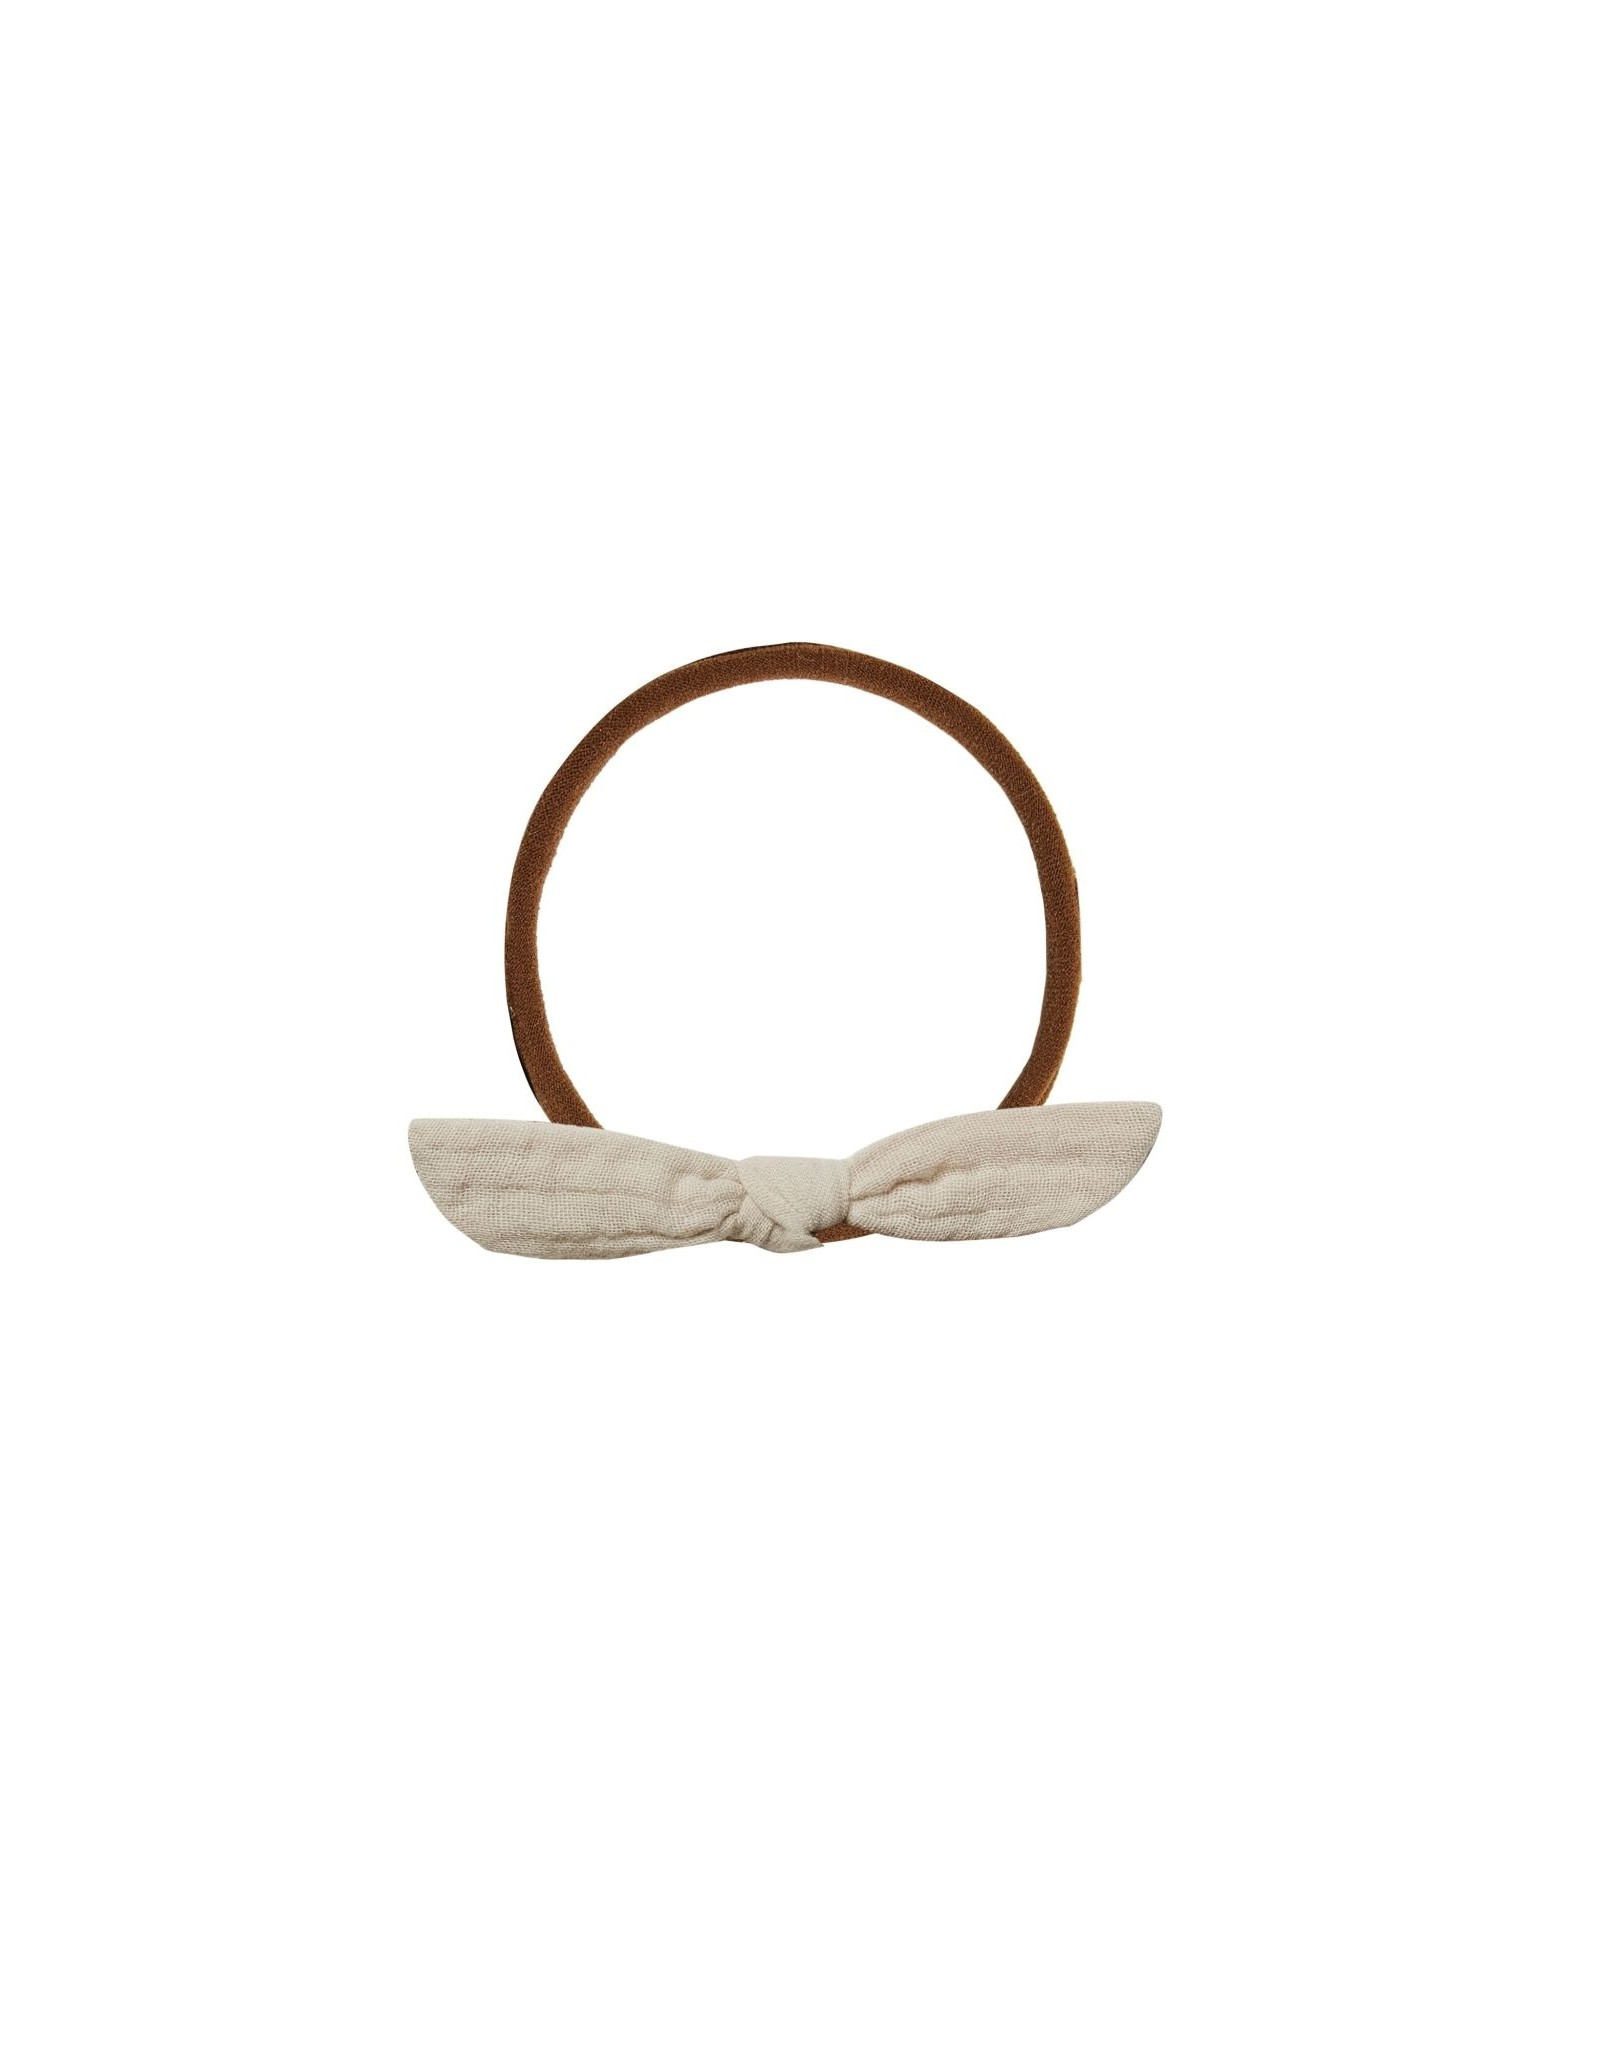 Rylee + Cru Knotted Headband, Stone